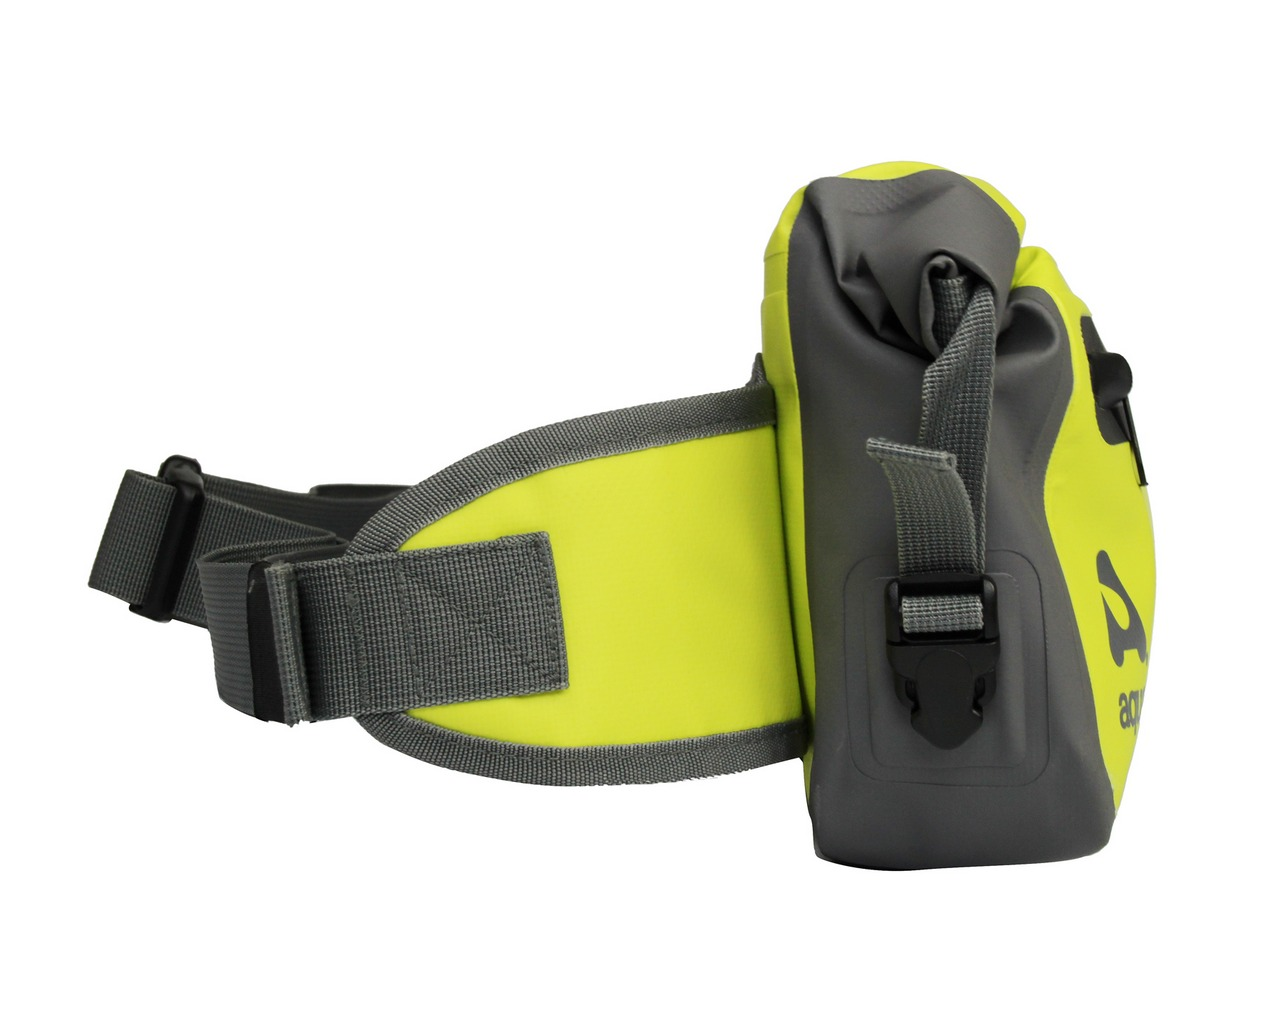 Водонепроницаемый чехол для документов - Aquapac 821. Aquapac - №1 в мире водонепроницаемых чехлов и сумок. Фото 2